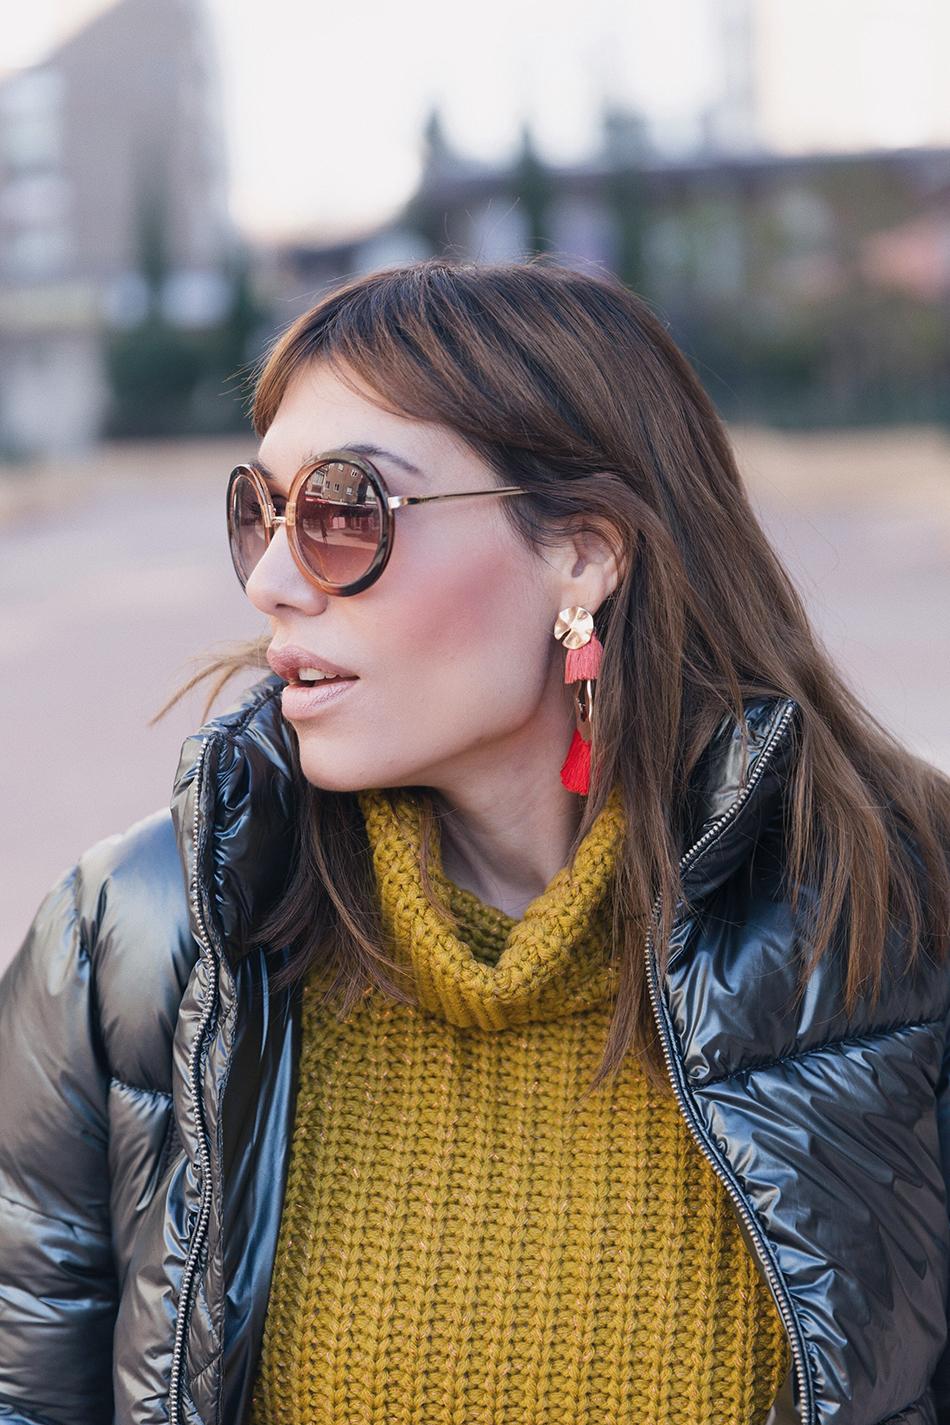 Bárbara Crespo street style. Puffy jacket/Plumas: Kiabi. Pullover/jersey: Kiabi. Ripped Jeans: Zara. Boots/Botines de Calcetín: Zara. Trendy outfit